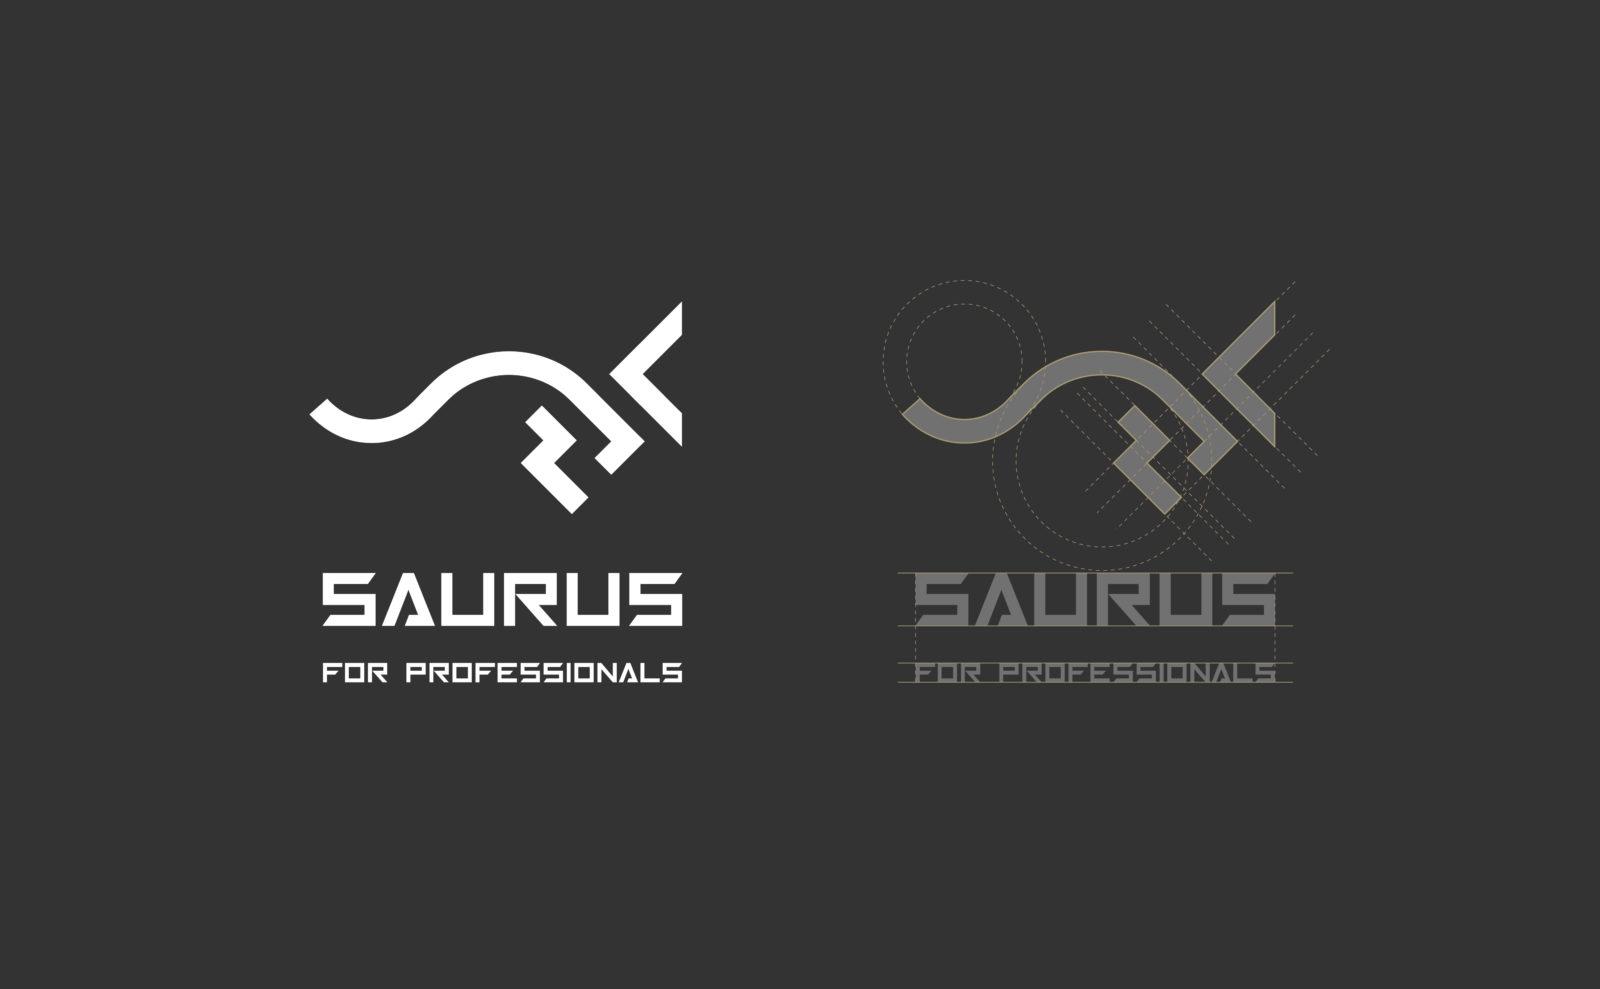 SAURUS_VI__-4